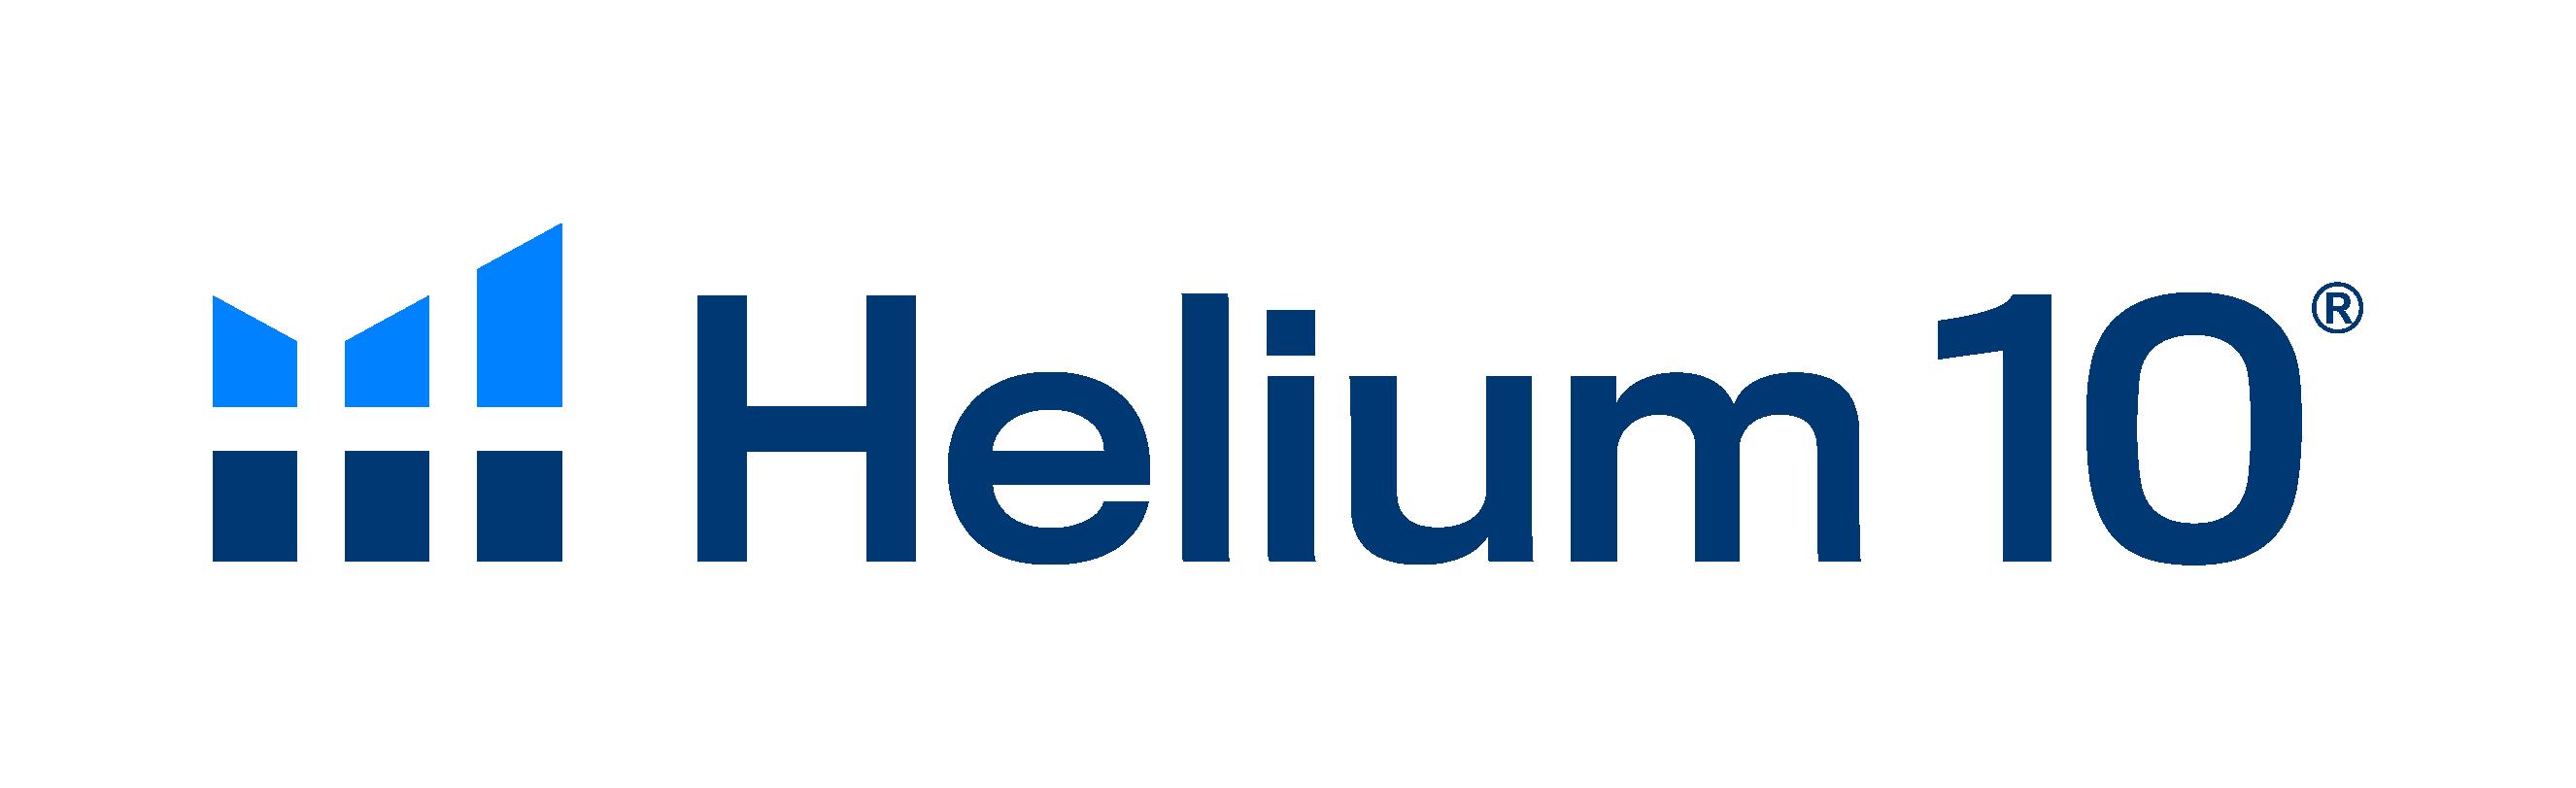 Helium 10 Magnet Anleitung